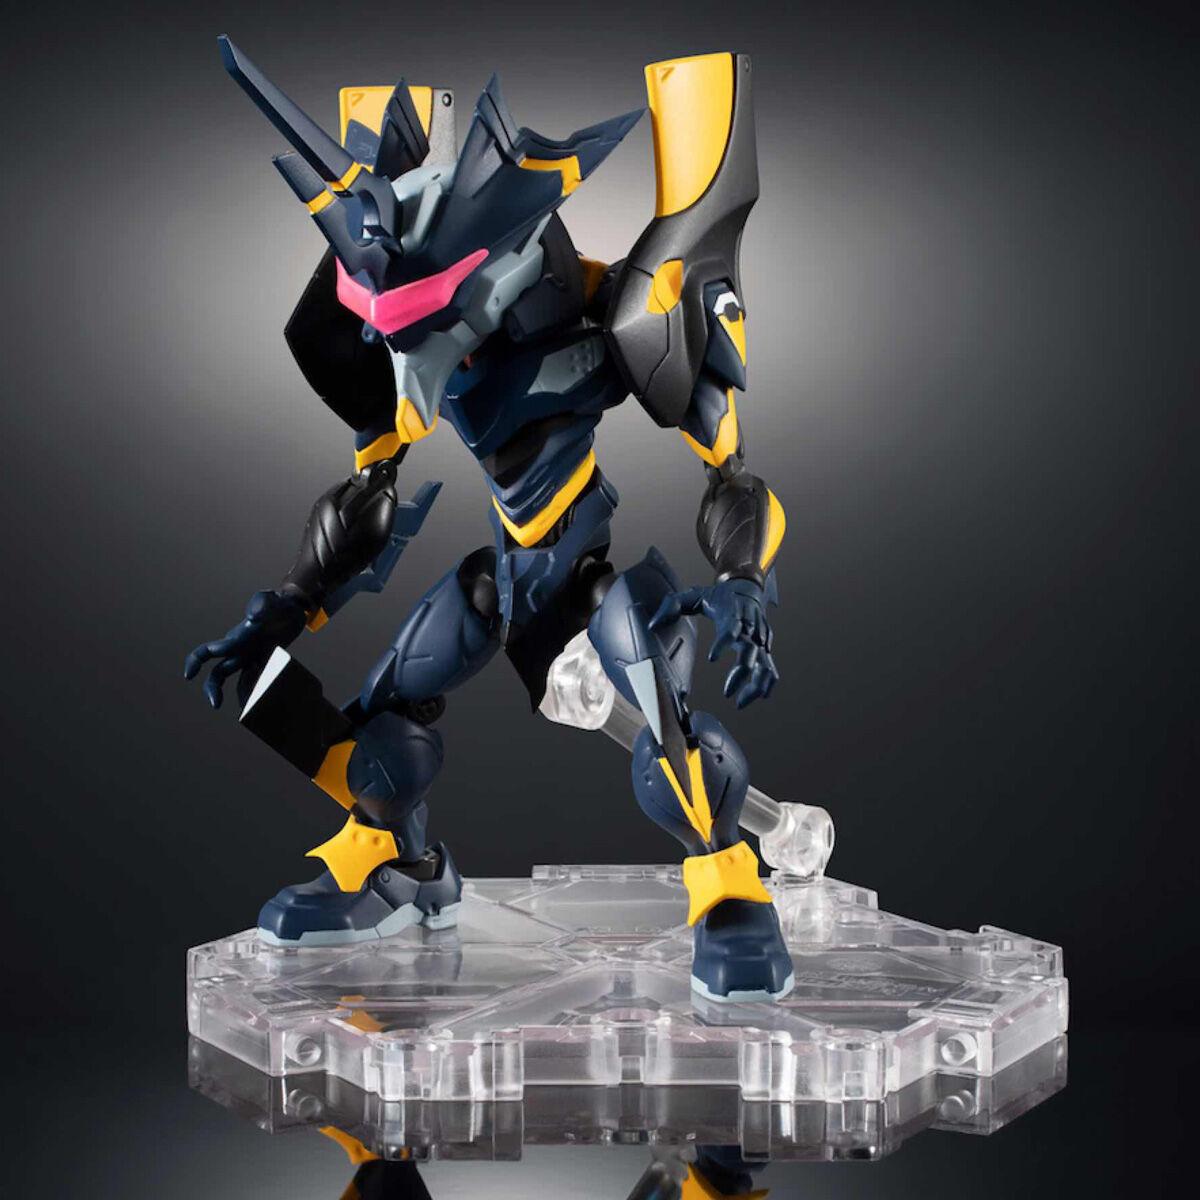 Figura Eva Unit MK 06 Neon Genesis Evangelion 10cm